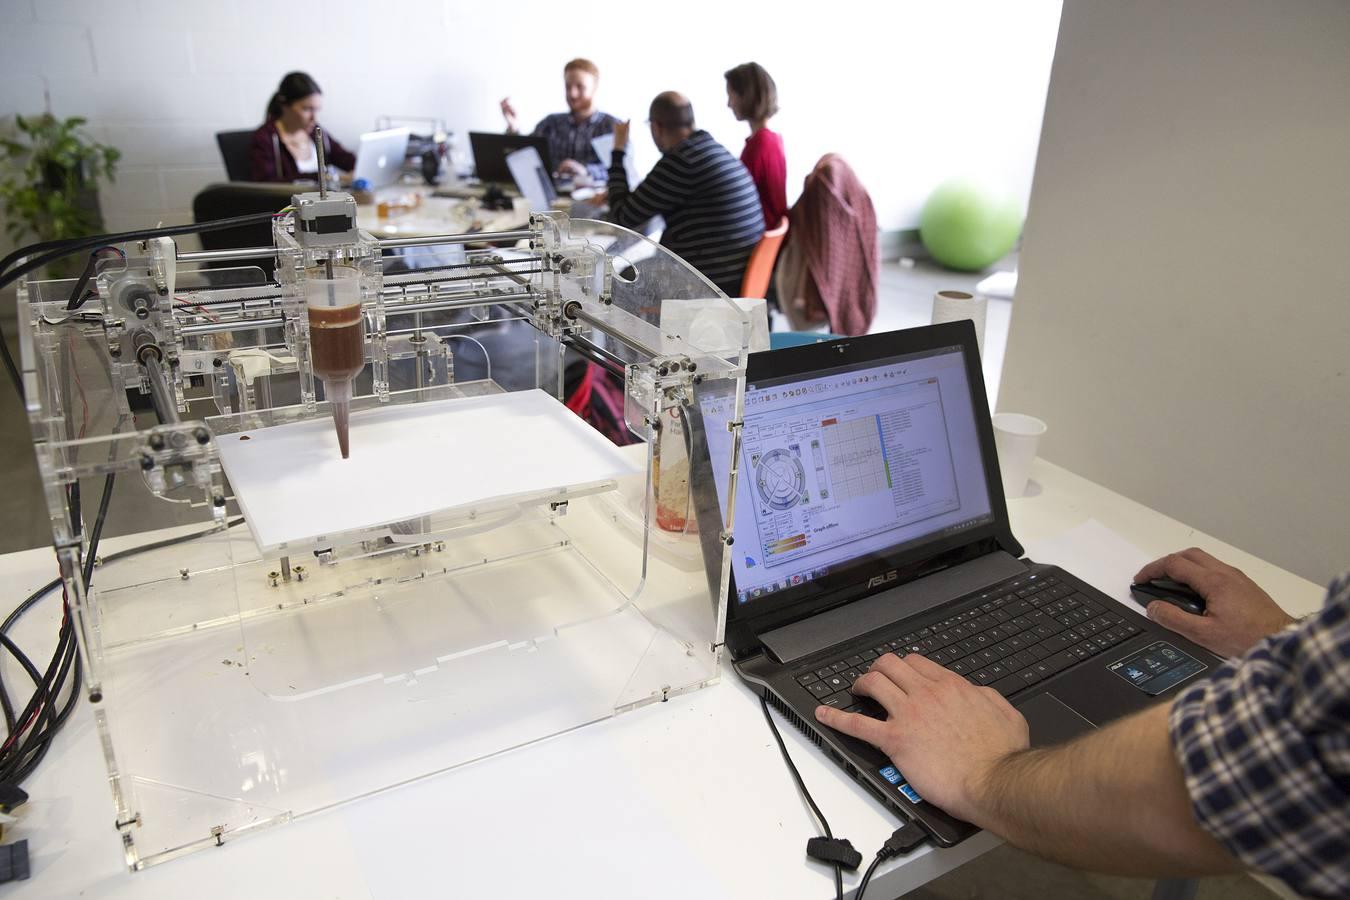 Así funciona Foodini, la primera impresora de comida española